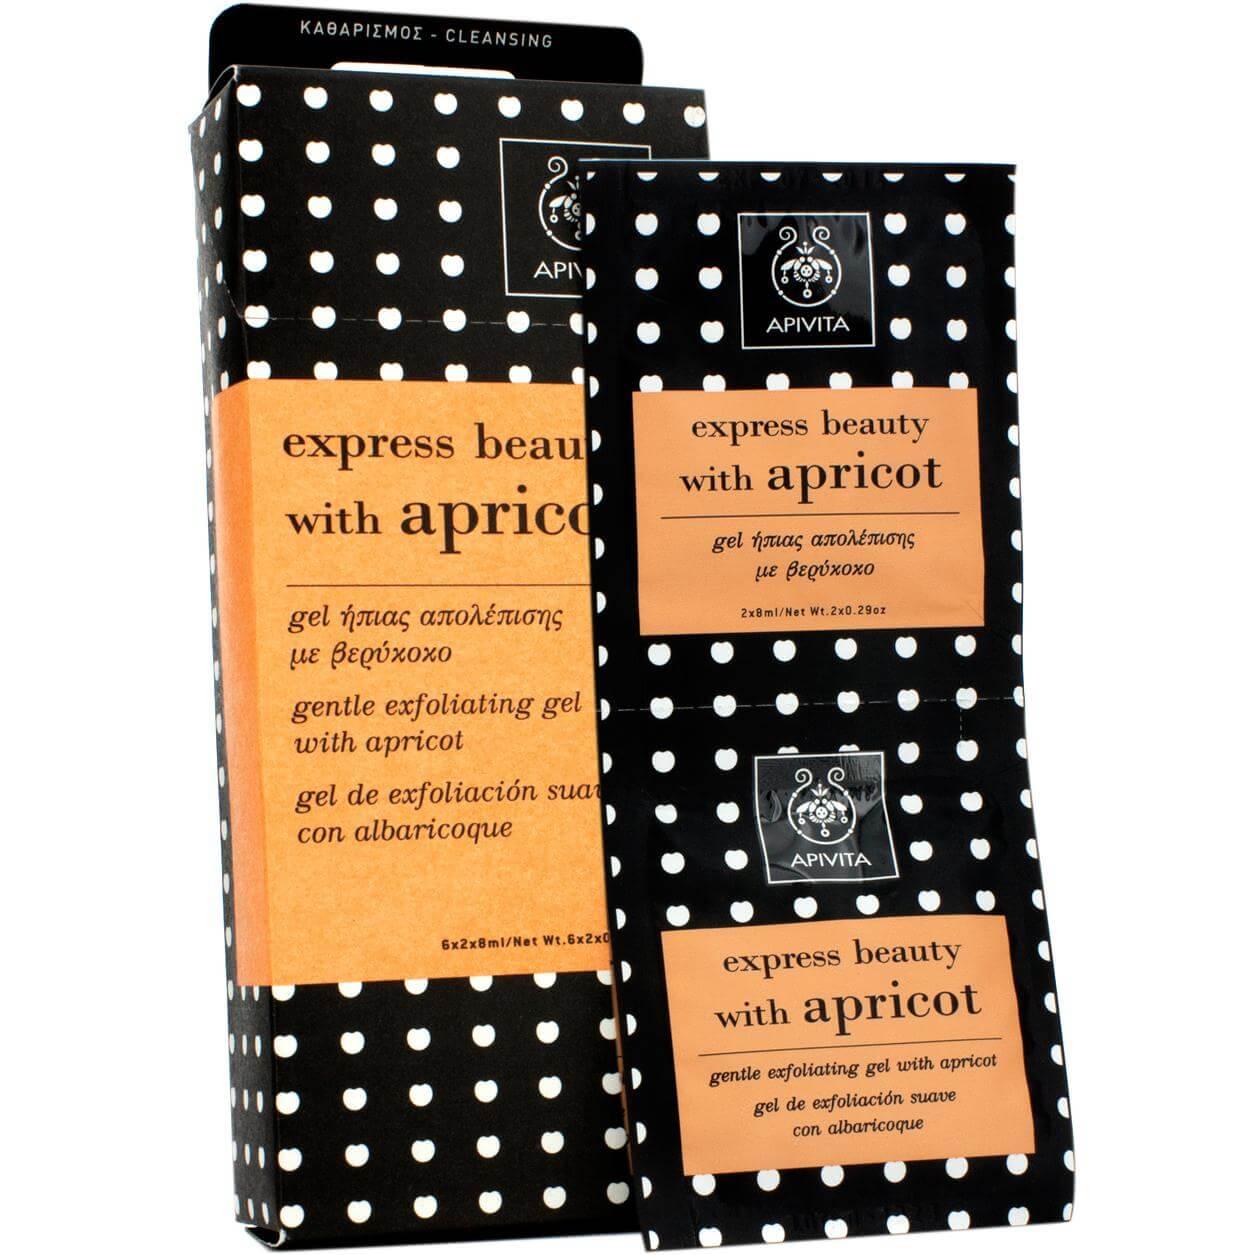 Apivita Express Beauty Gel Ήπιας Απολέπισης Με Βερίκοκο 2x8ml